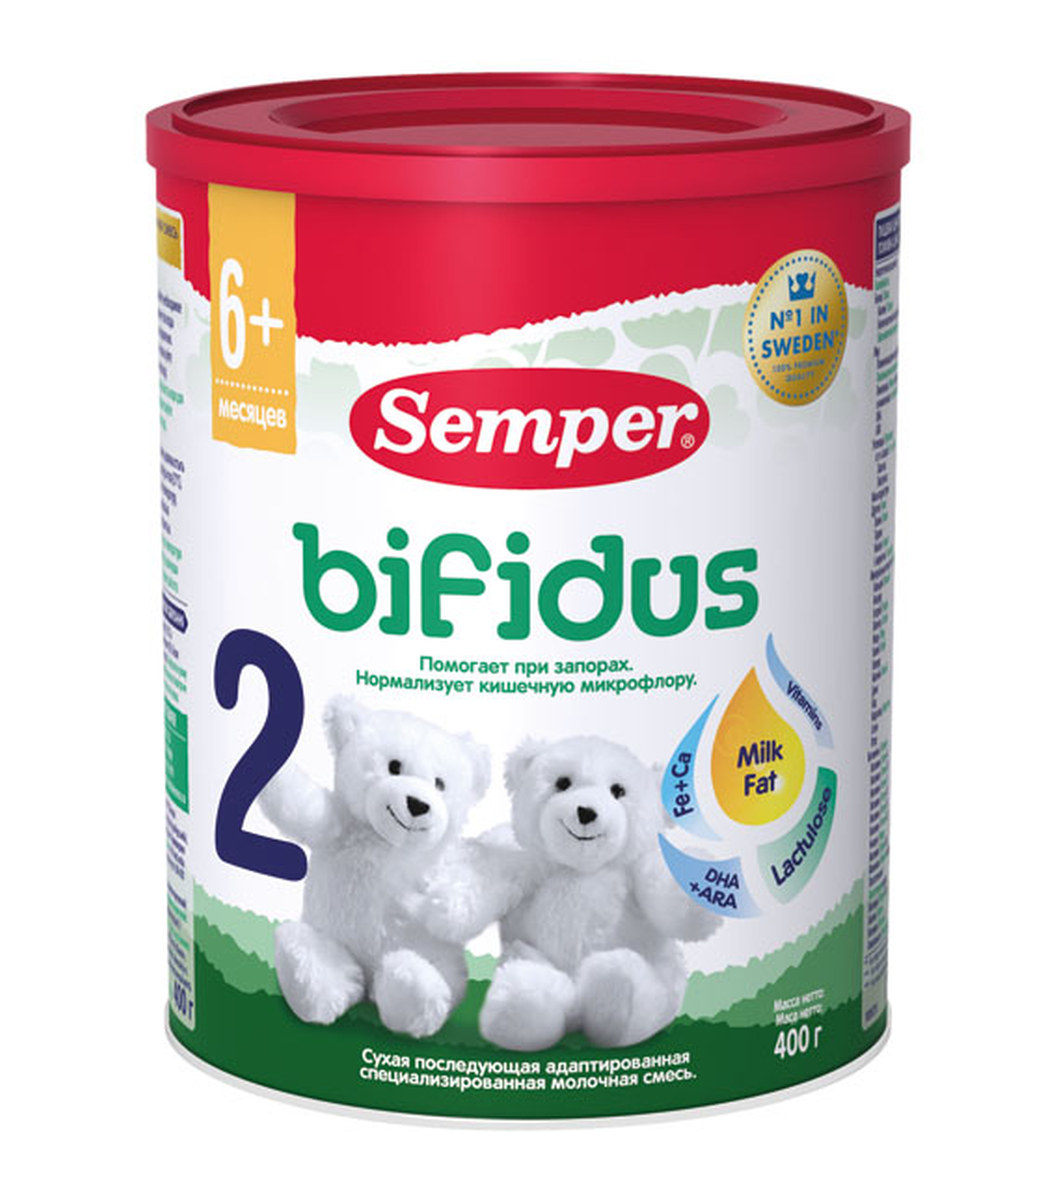 Semper Bifidus 2 смесь молочная с 6 месяцев, 400 г semper baby bifidus nutradefense 2 молочная смесь с 6 мес 400 гр